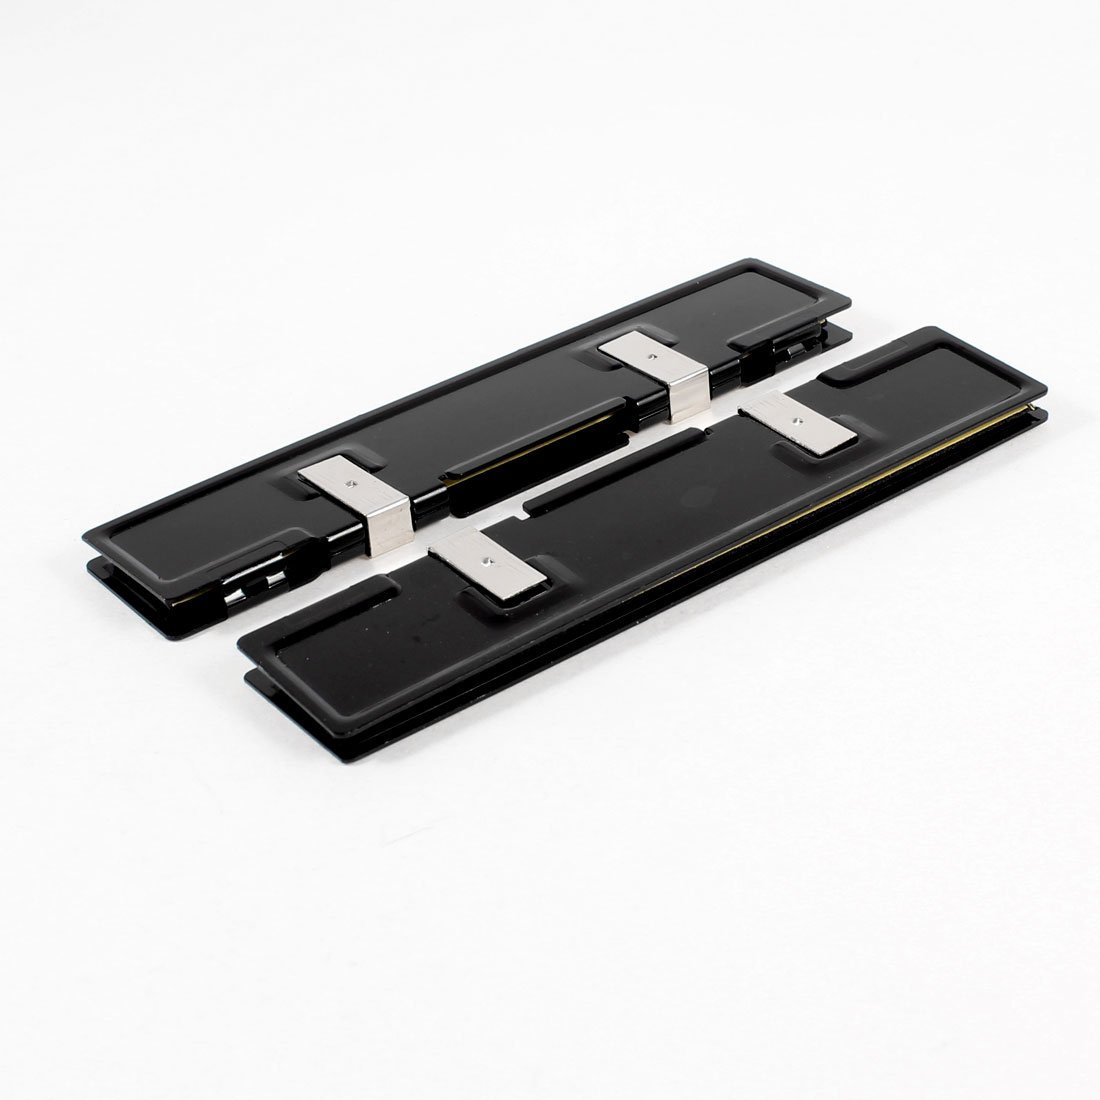 GTFS Hot 2 x Aluminum Heatsink Shim Spreader for DDR RAM Memory 2 x b ddr ddr2 ram memory cooler heat spreader heatsink z09 drop ship